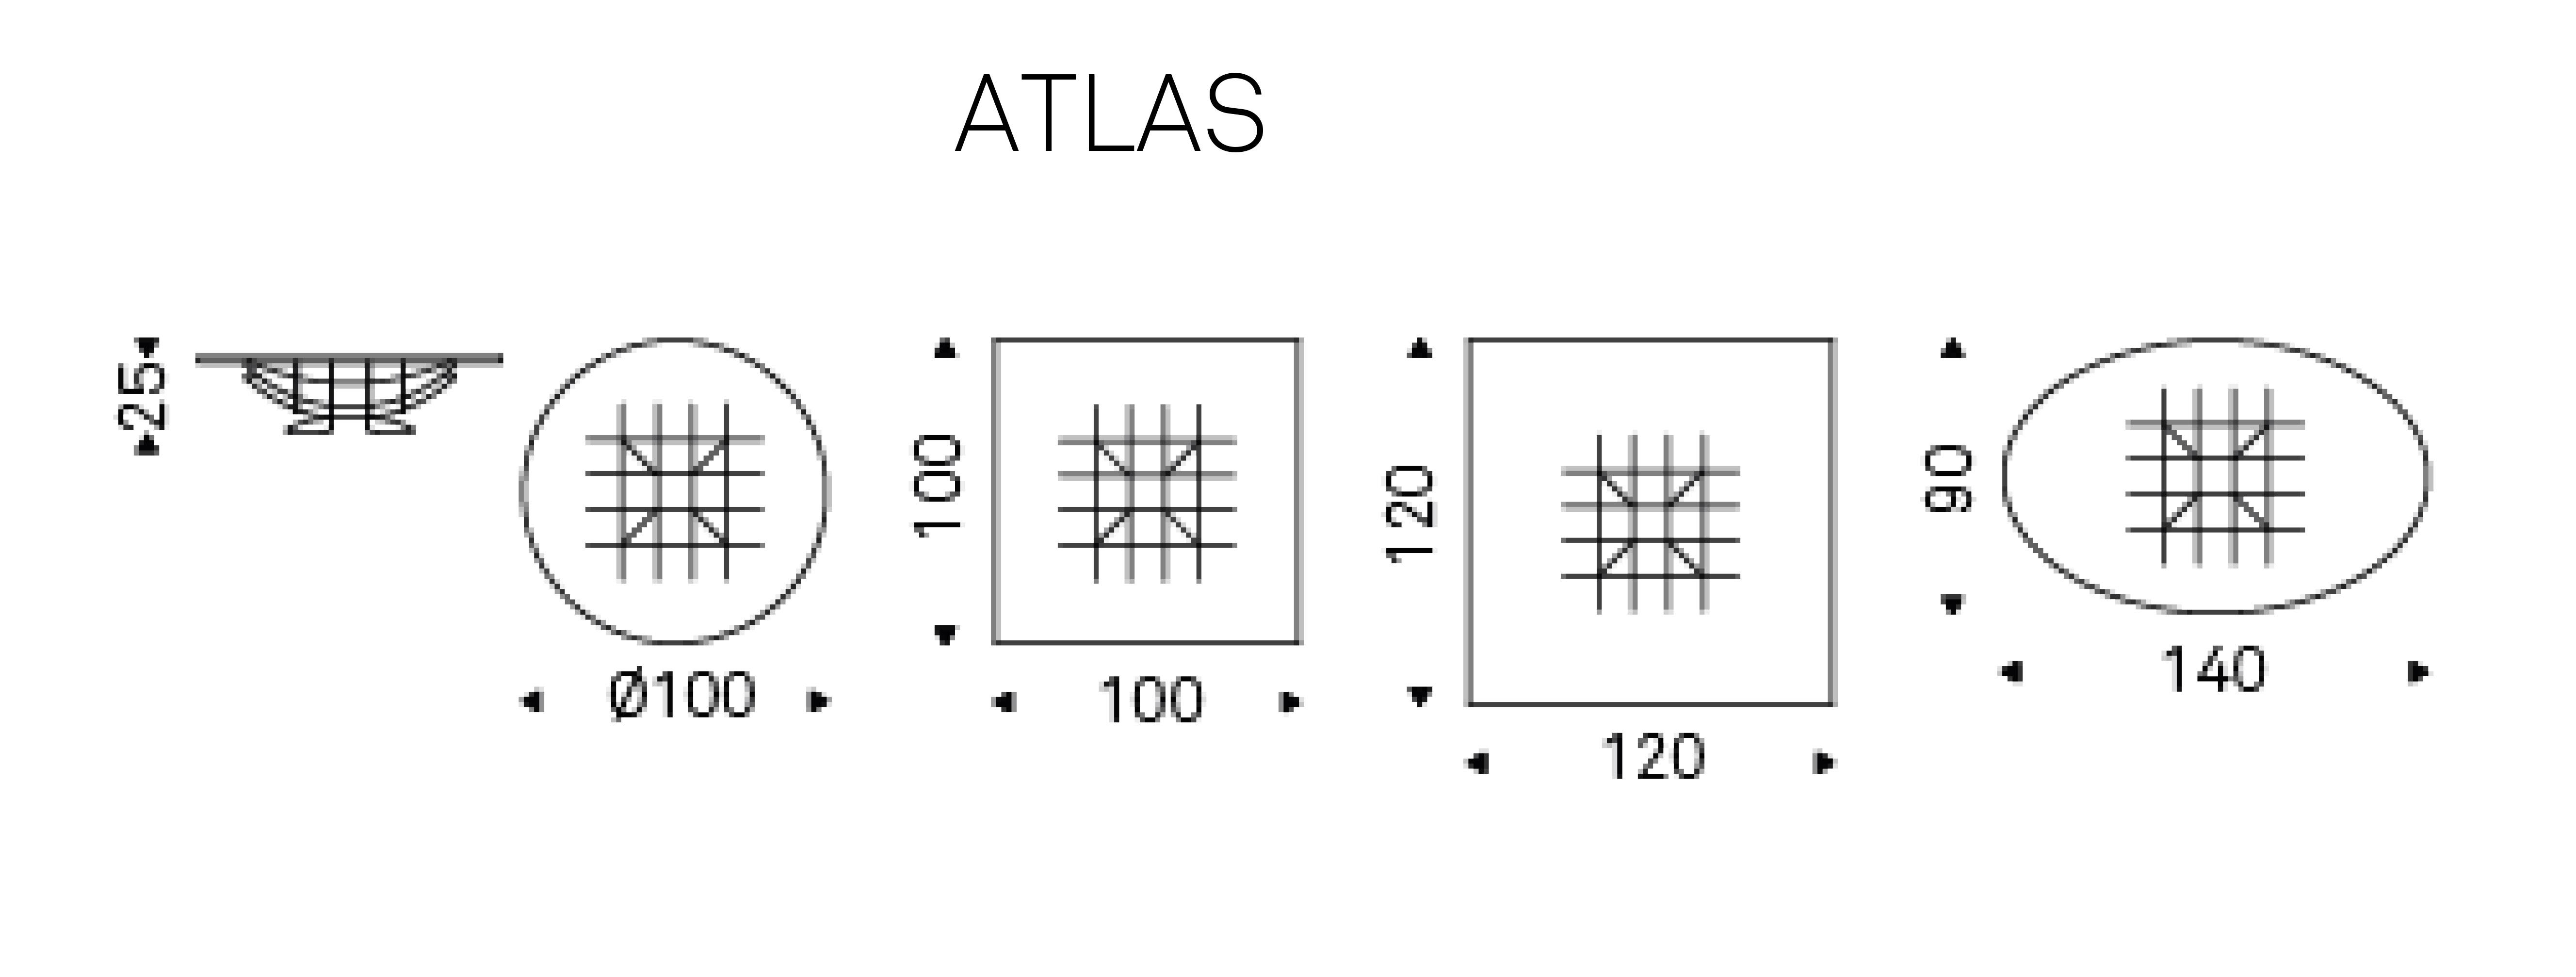 Tavolino Atlas Cattelan Italia dimensioni